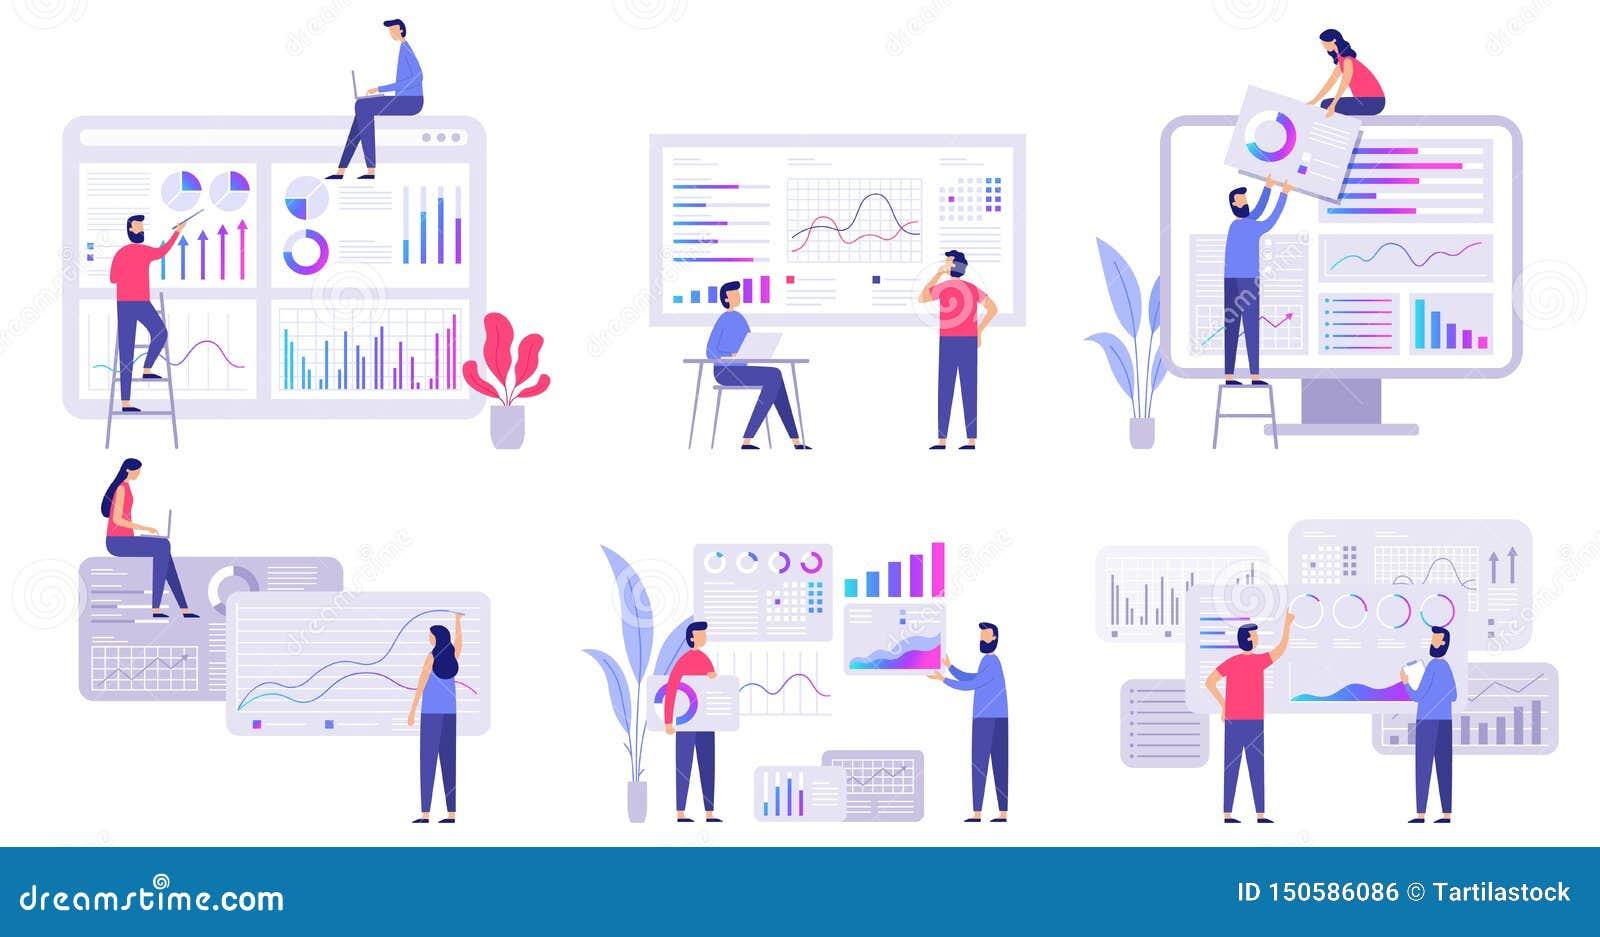 Market forecast. Trends analytics, business marketing strategy and market forecasting flat vector illustration set